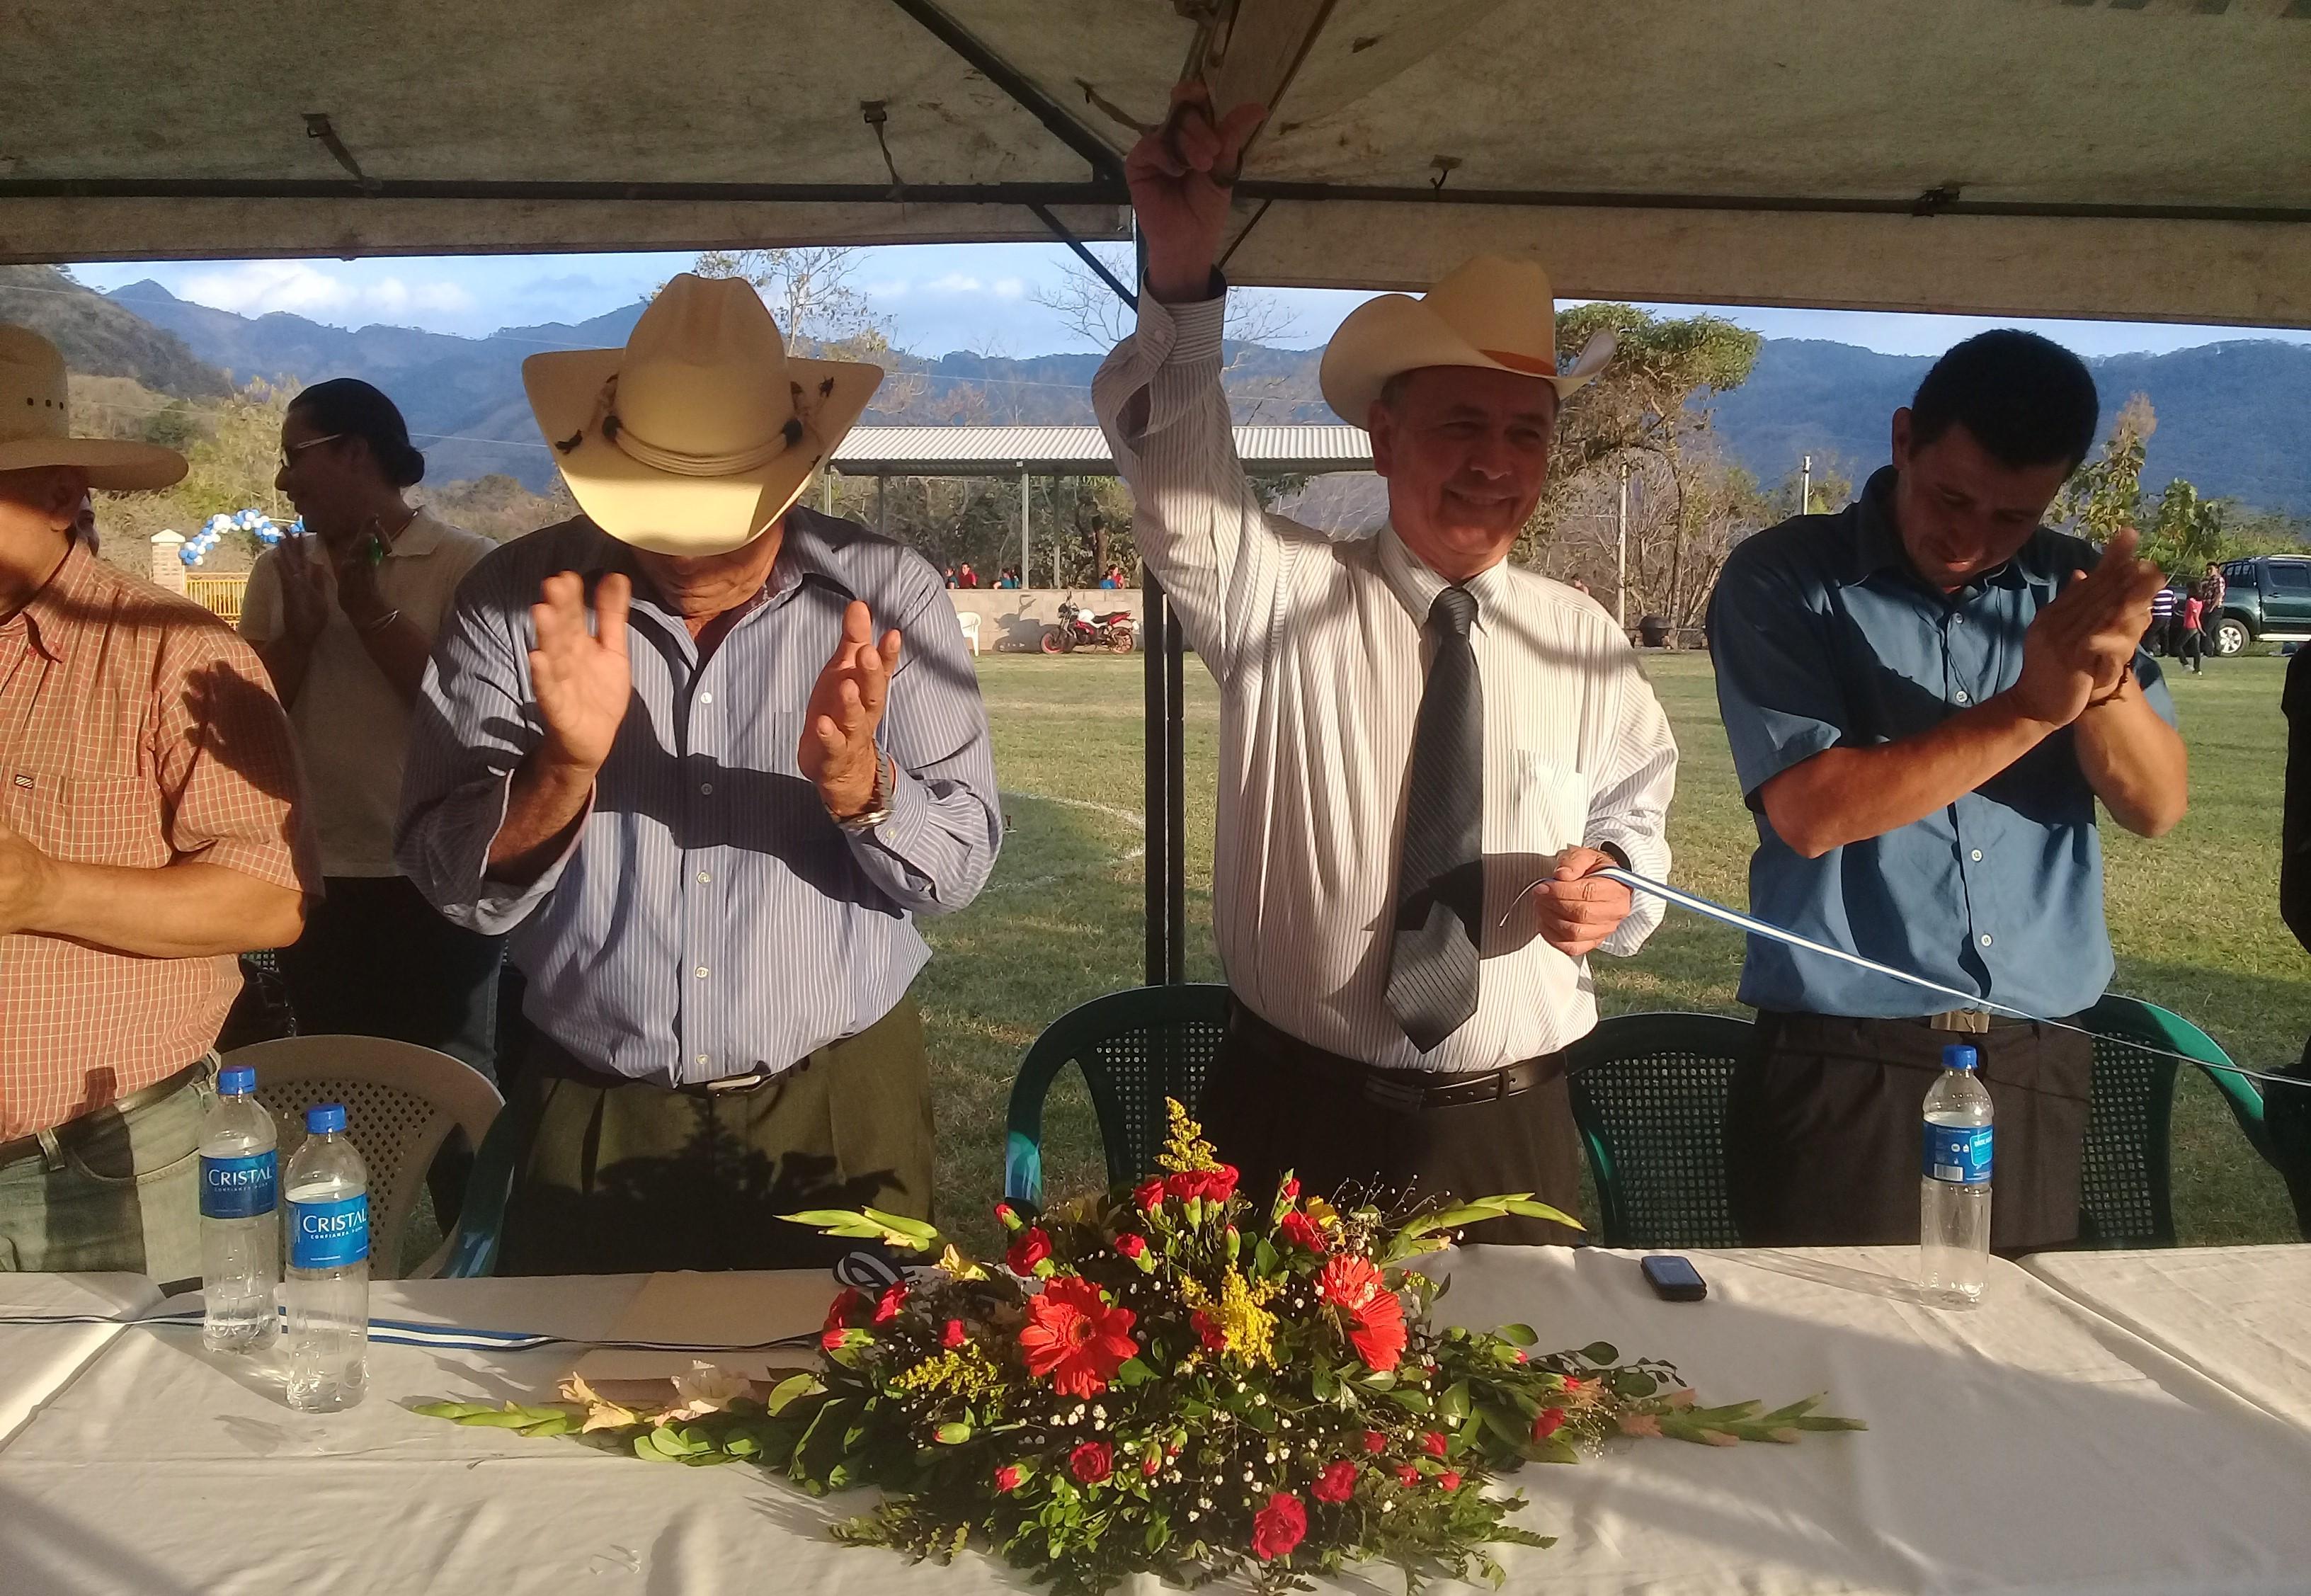 Alcaldía inaugura cancha deportiva en cantón Las Tapias en Metapan